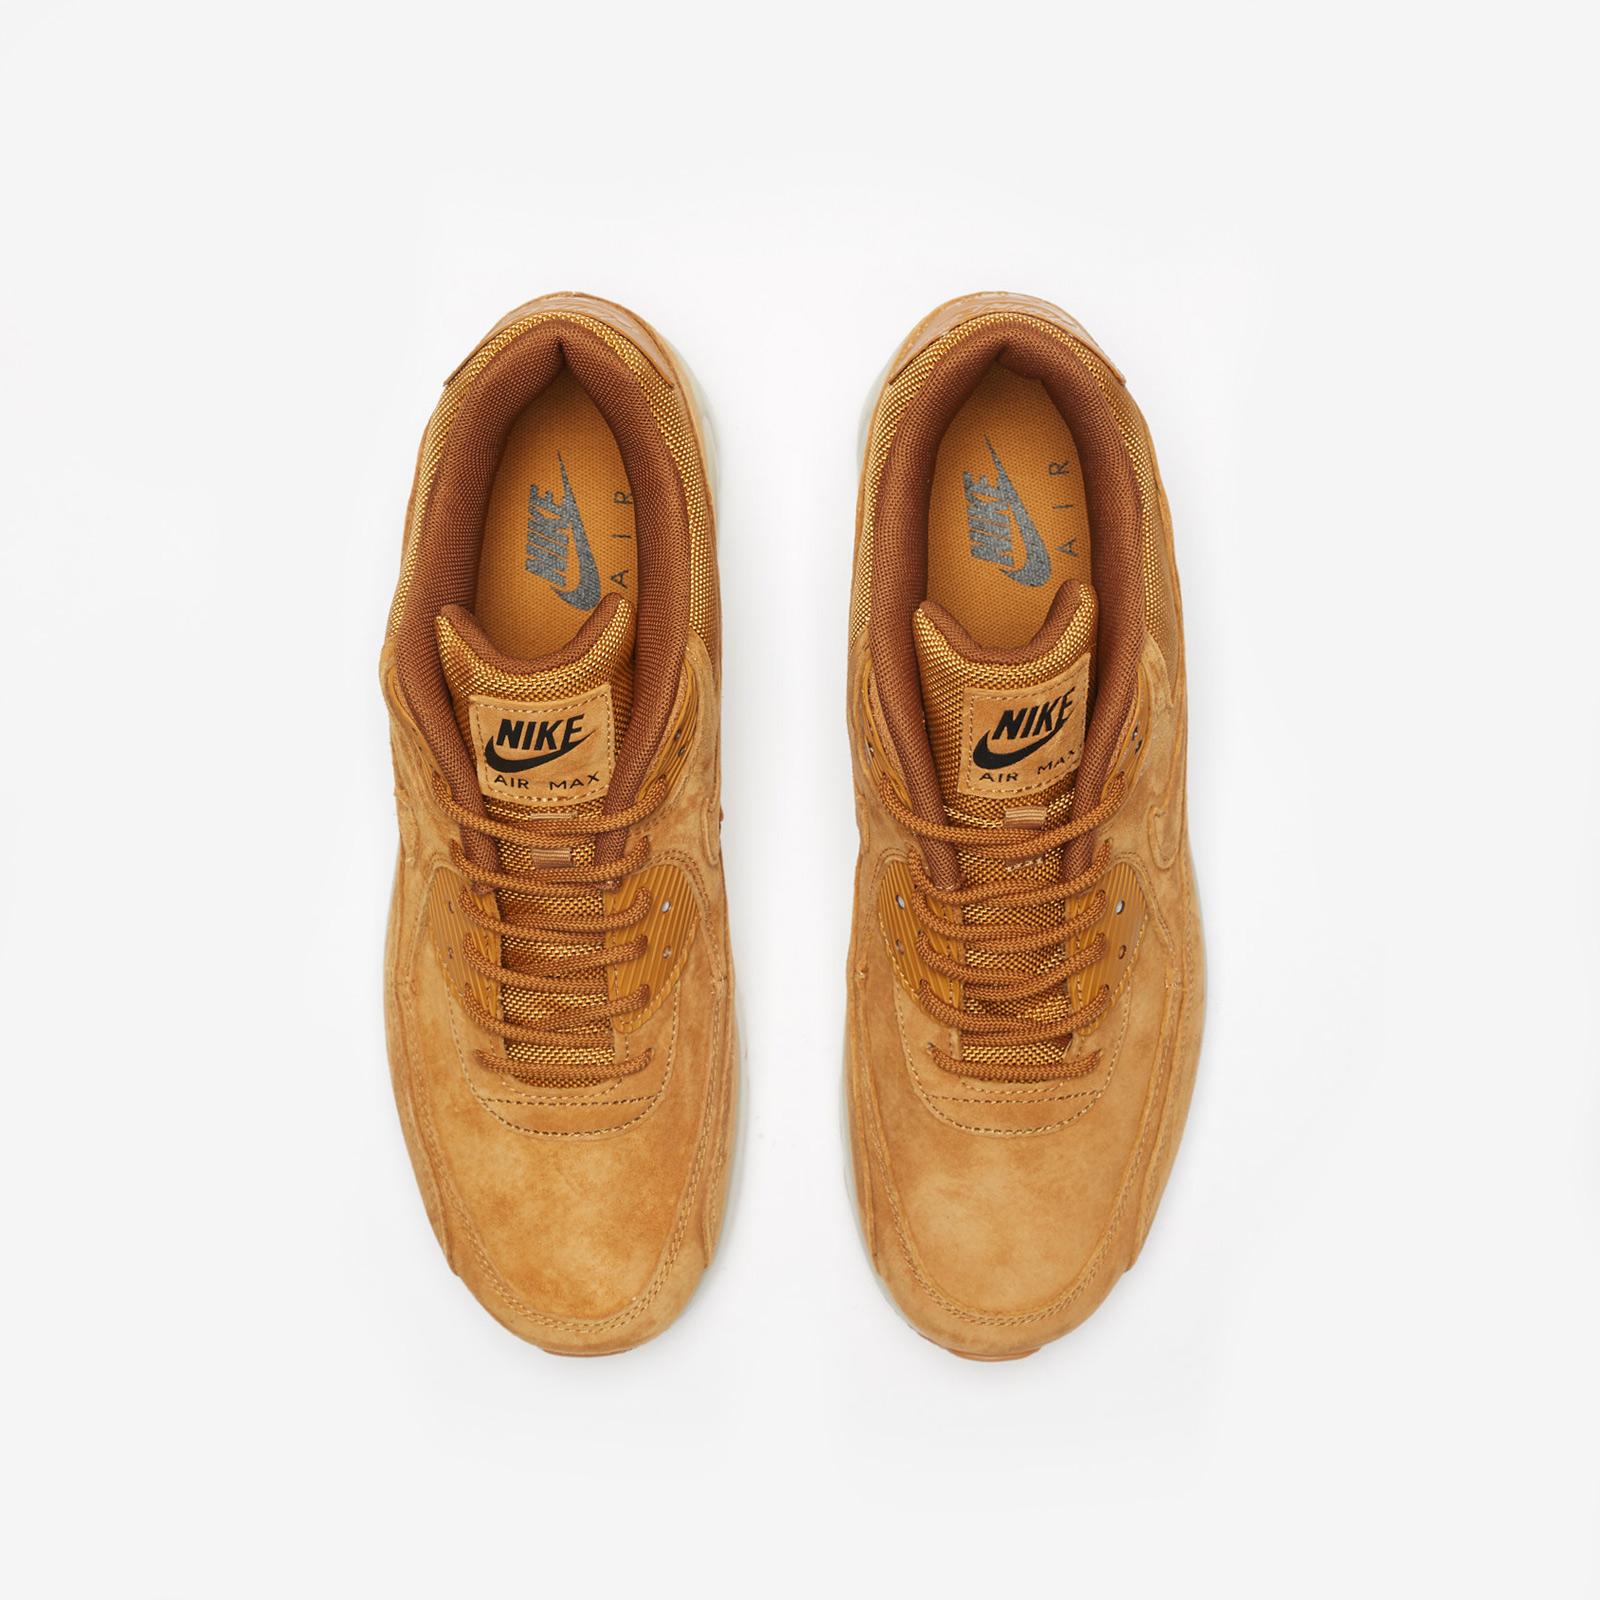 quality design cc099 5bee9 Nike Sportswear Air Max 90 Ultra 2.0 LTR - 7. Close